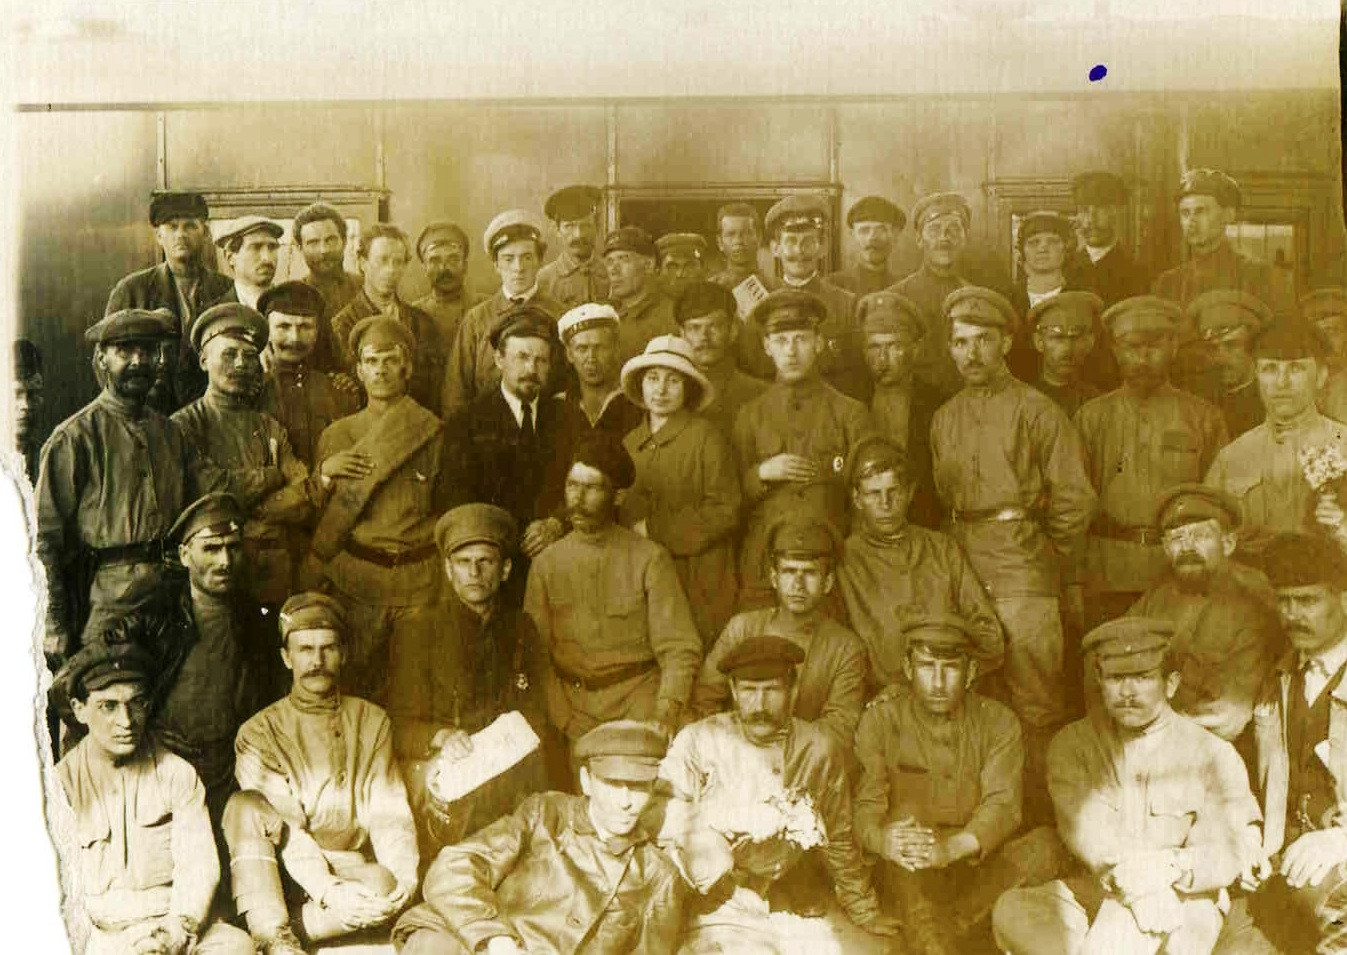 1918. Члены Моссовета, отъезжающие на Петроградский фронт. Москва